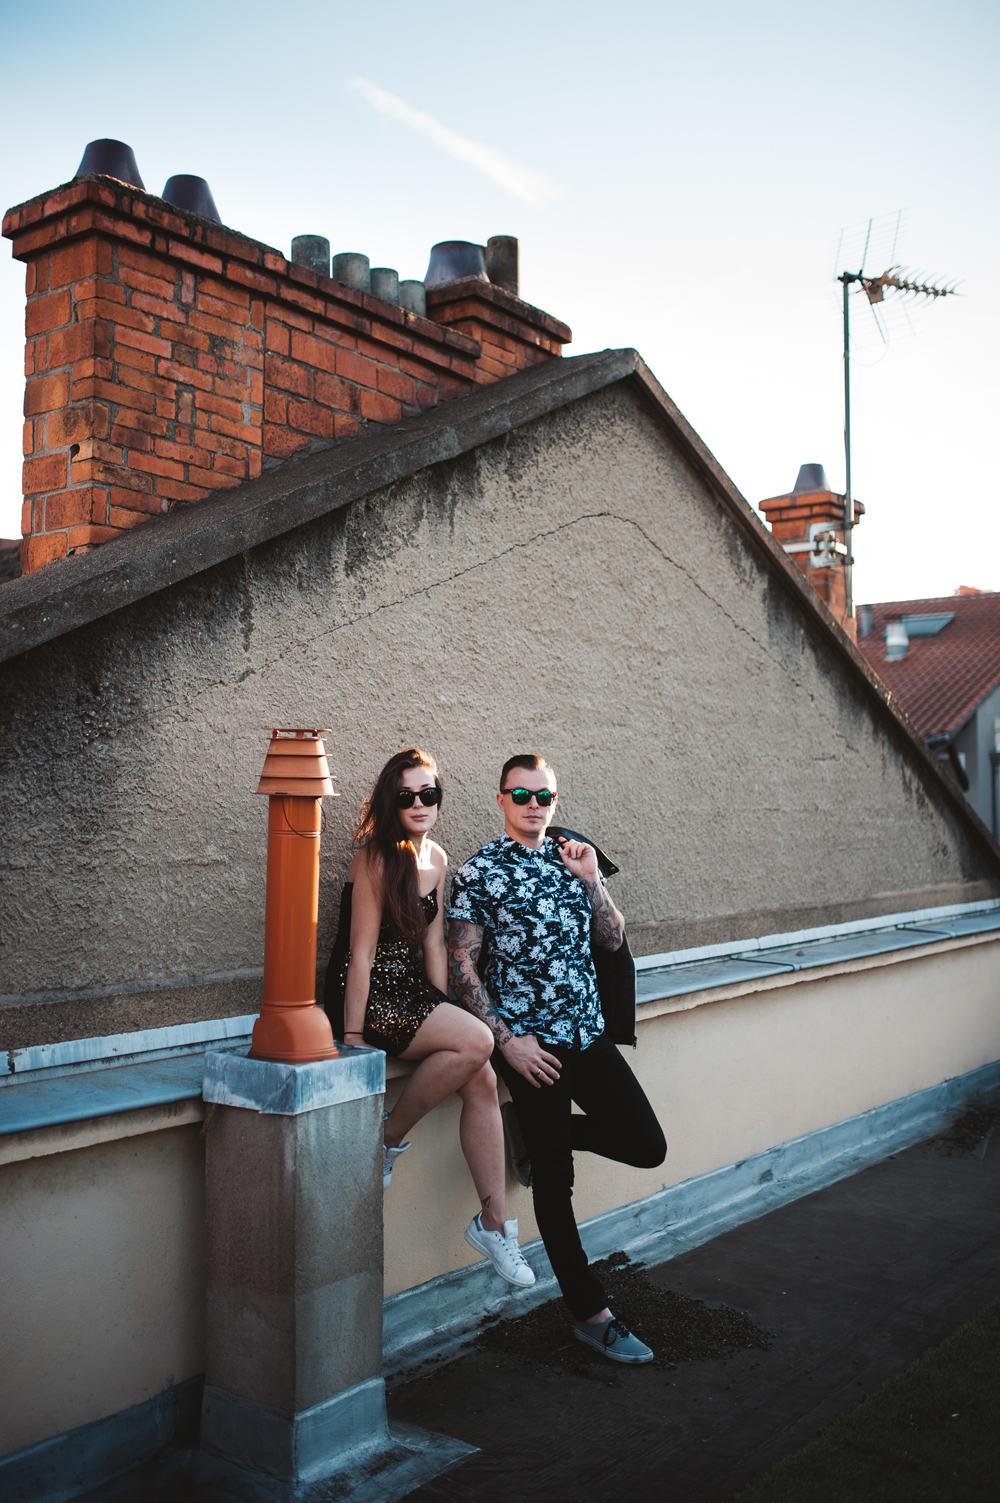 melanie-bultez-photographe-mariage-alternatif-rock-rooftop-wedding-couple-lyon-1